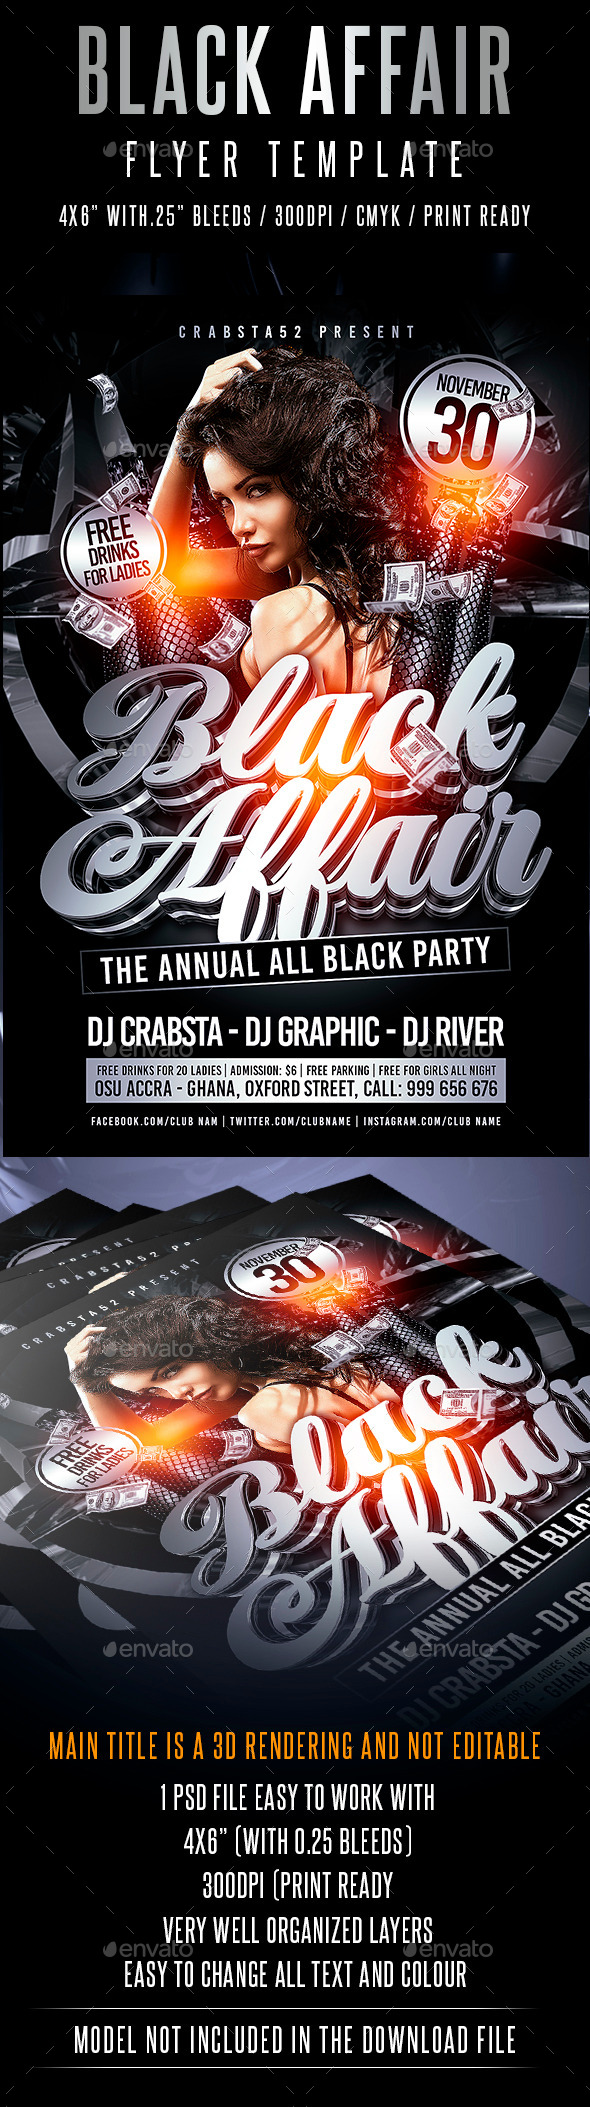 Black Affair Flyer Template